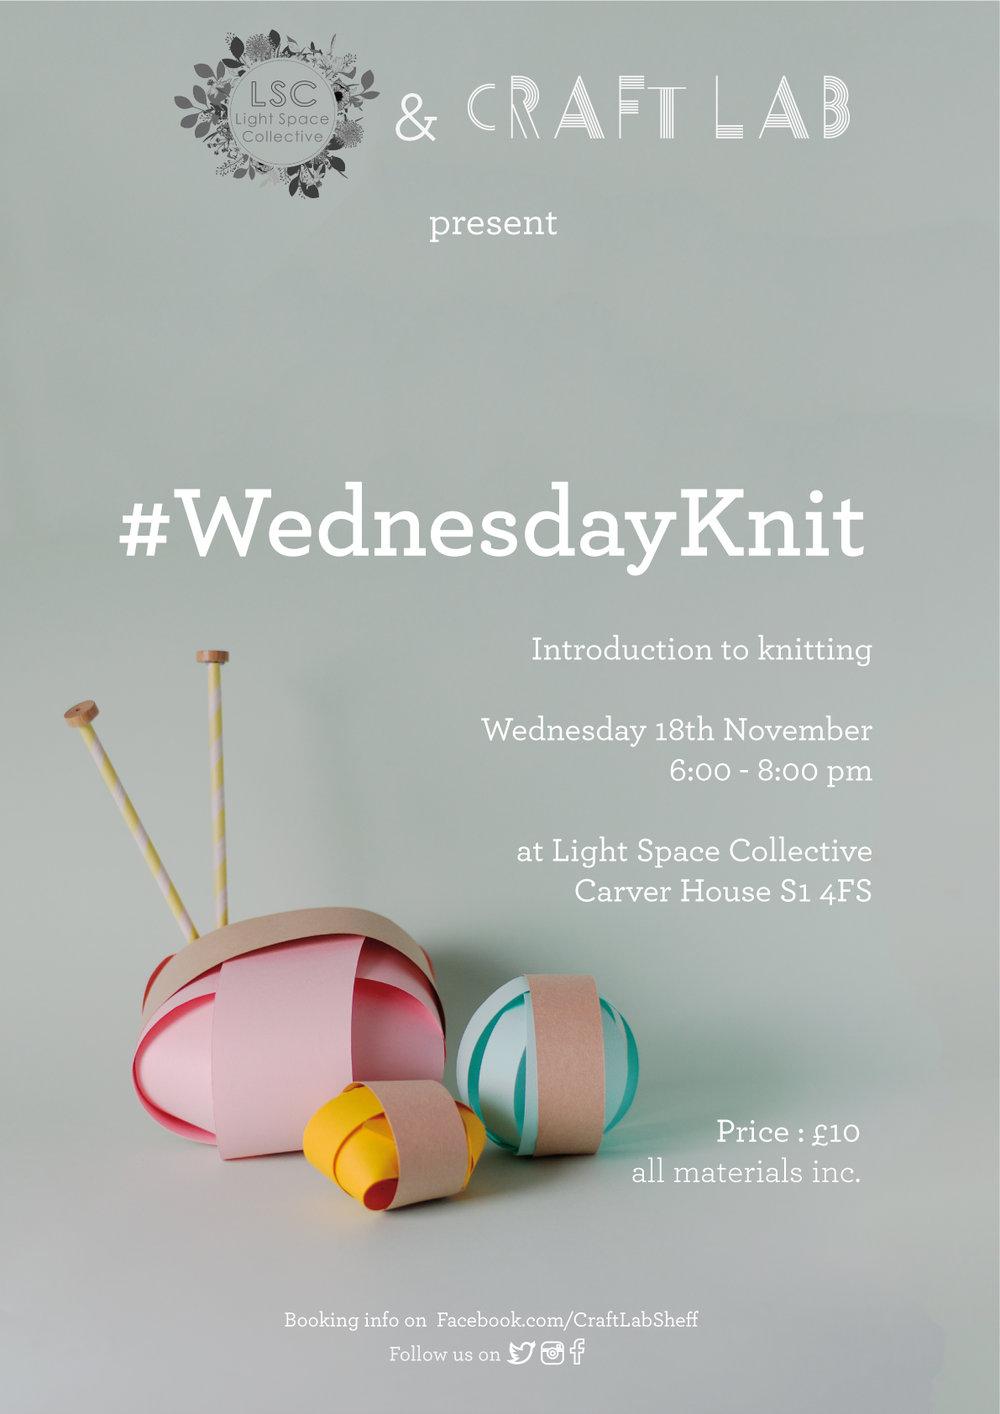 151024--poster-#WednesdayKnit.jpg